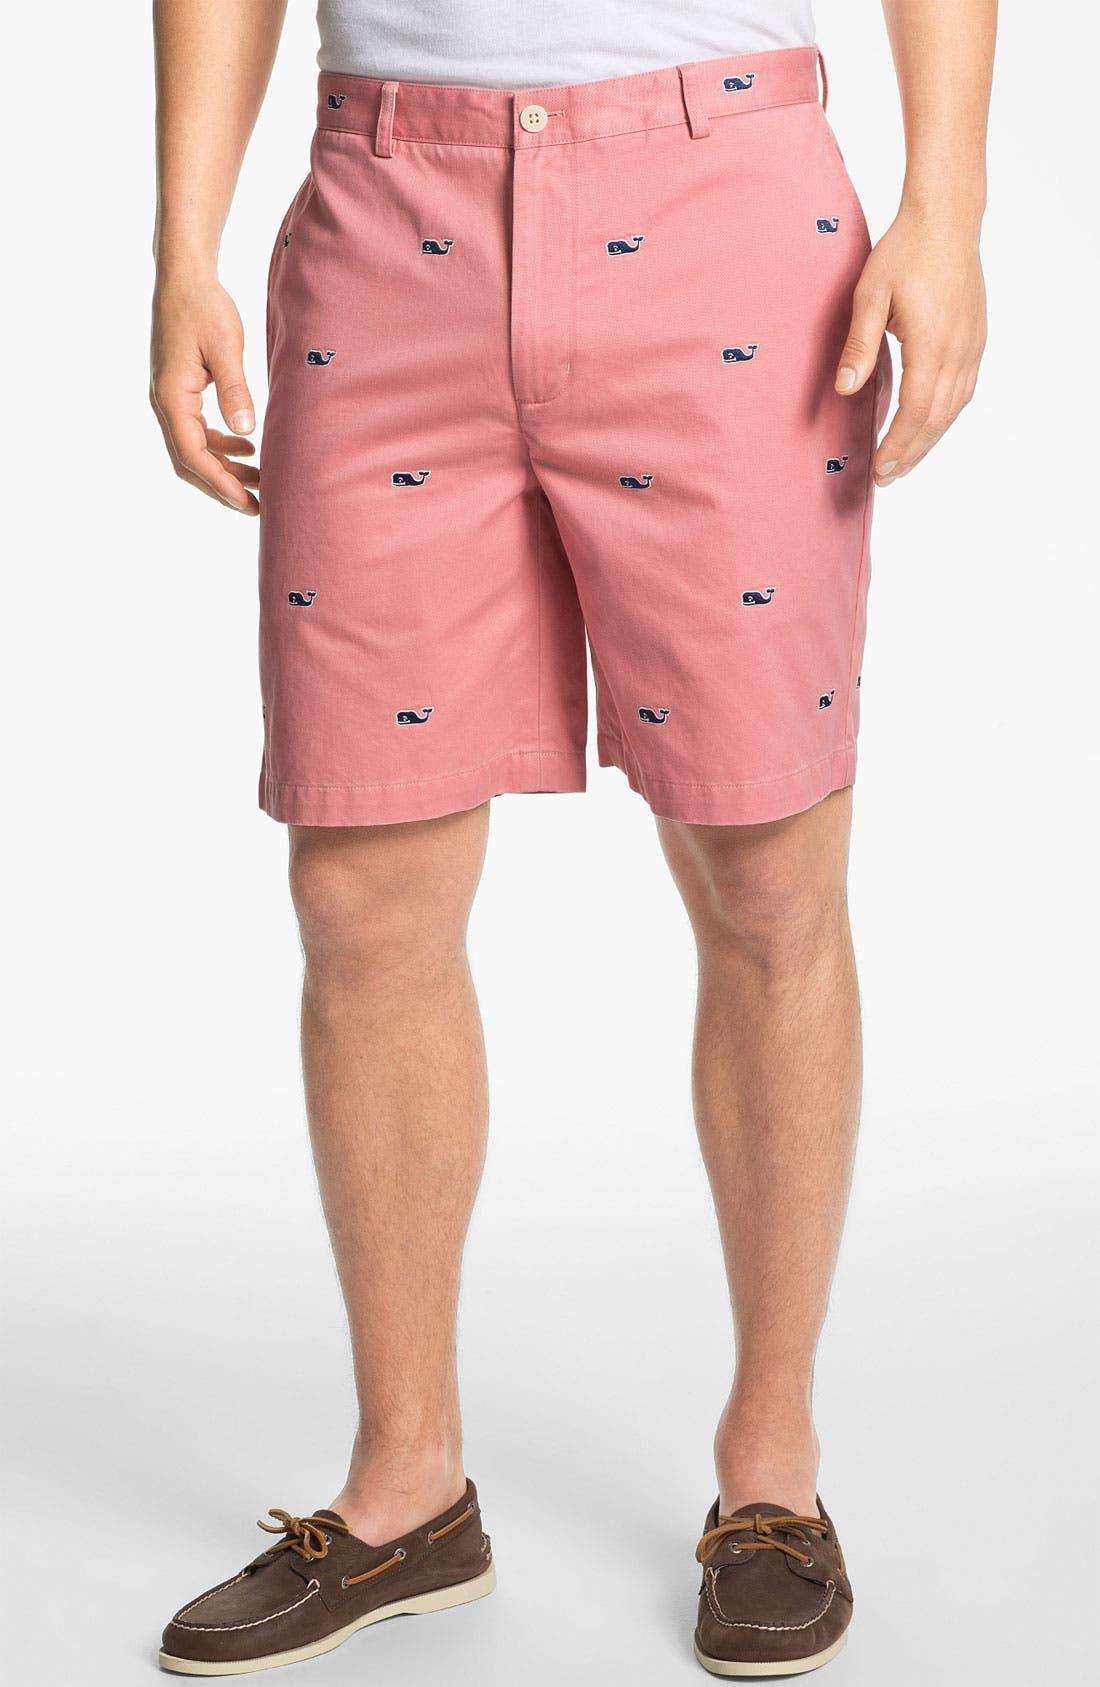 Alternate Image 1 Selected - Vineyard Vines Flat Front Shorts